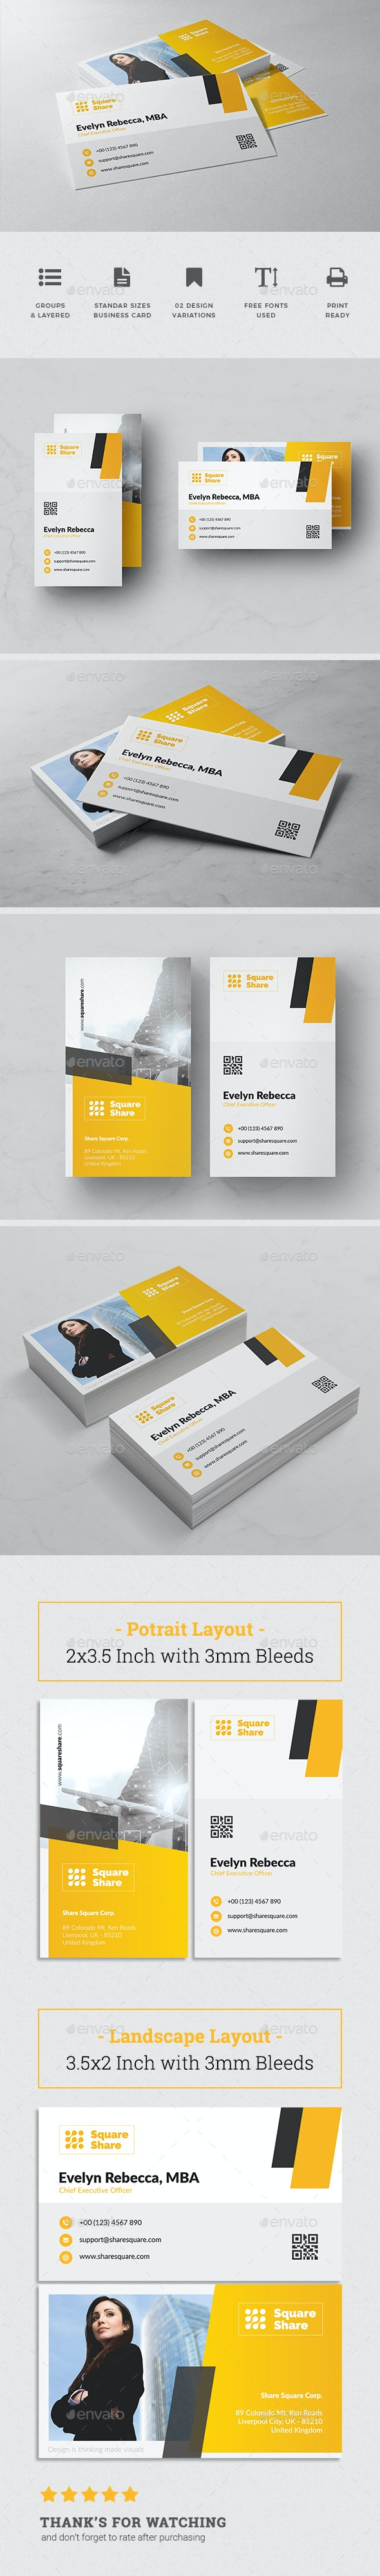 Minimalist Business Card Vol. 17 - Business Cards Print Templates